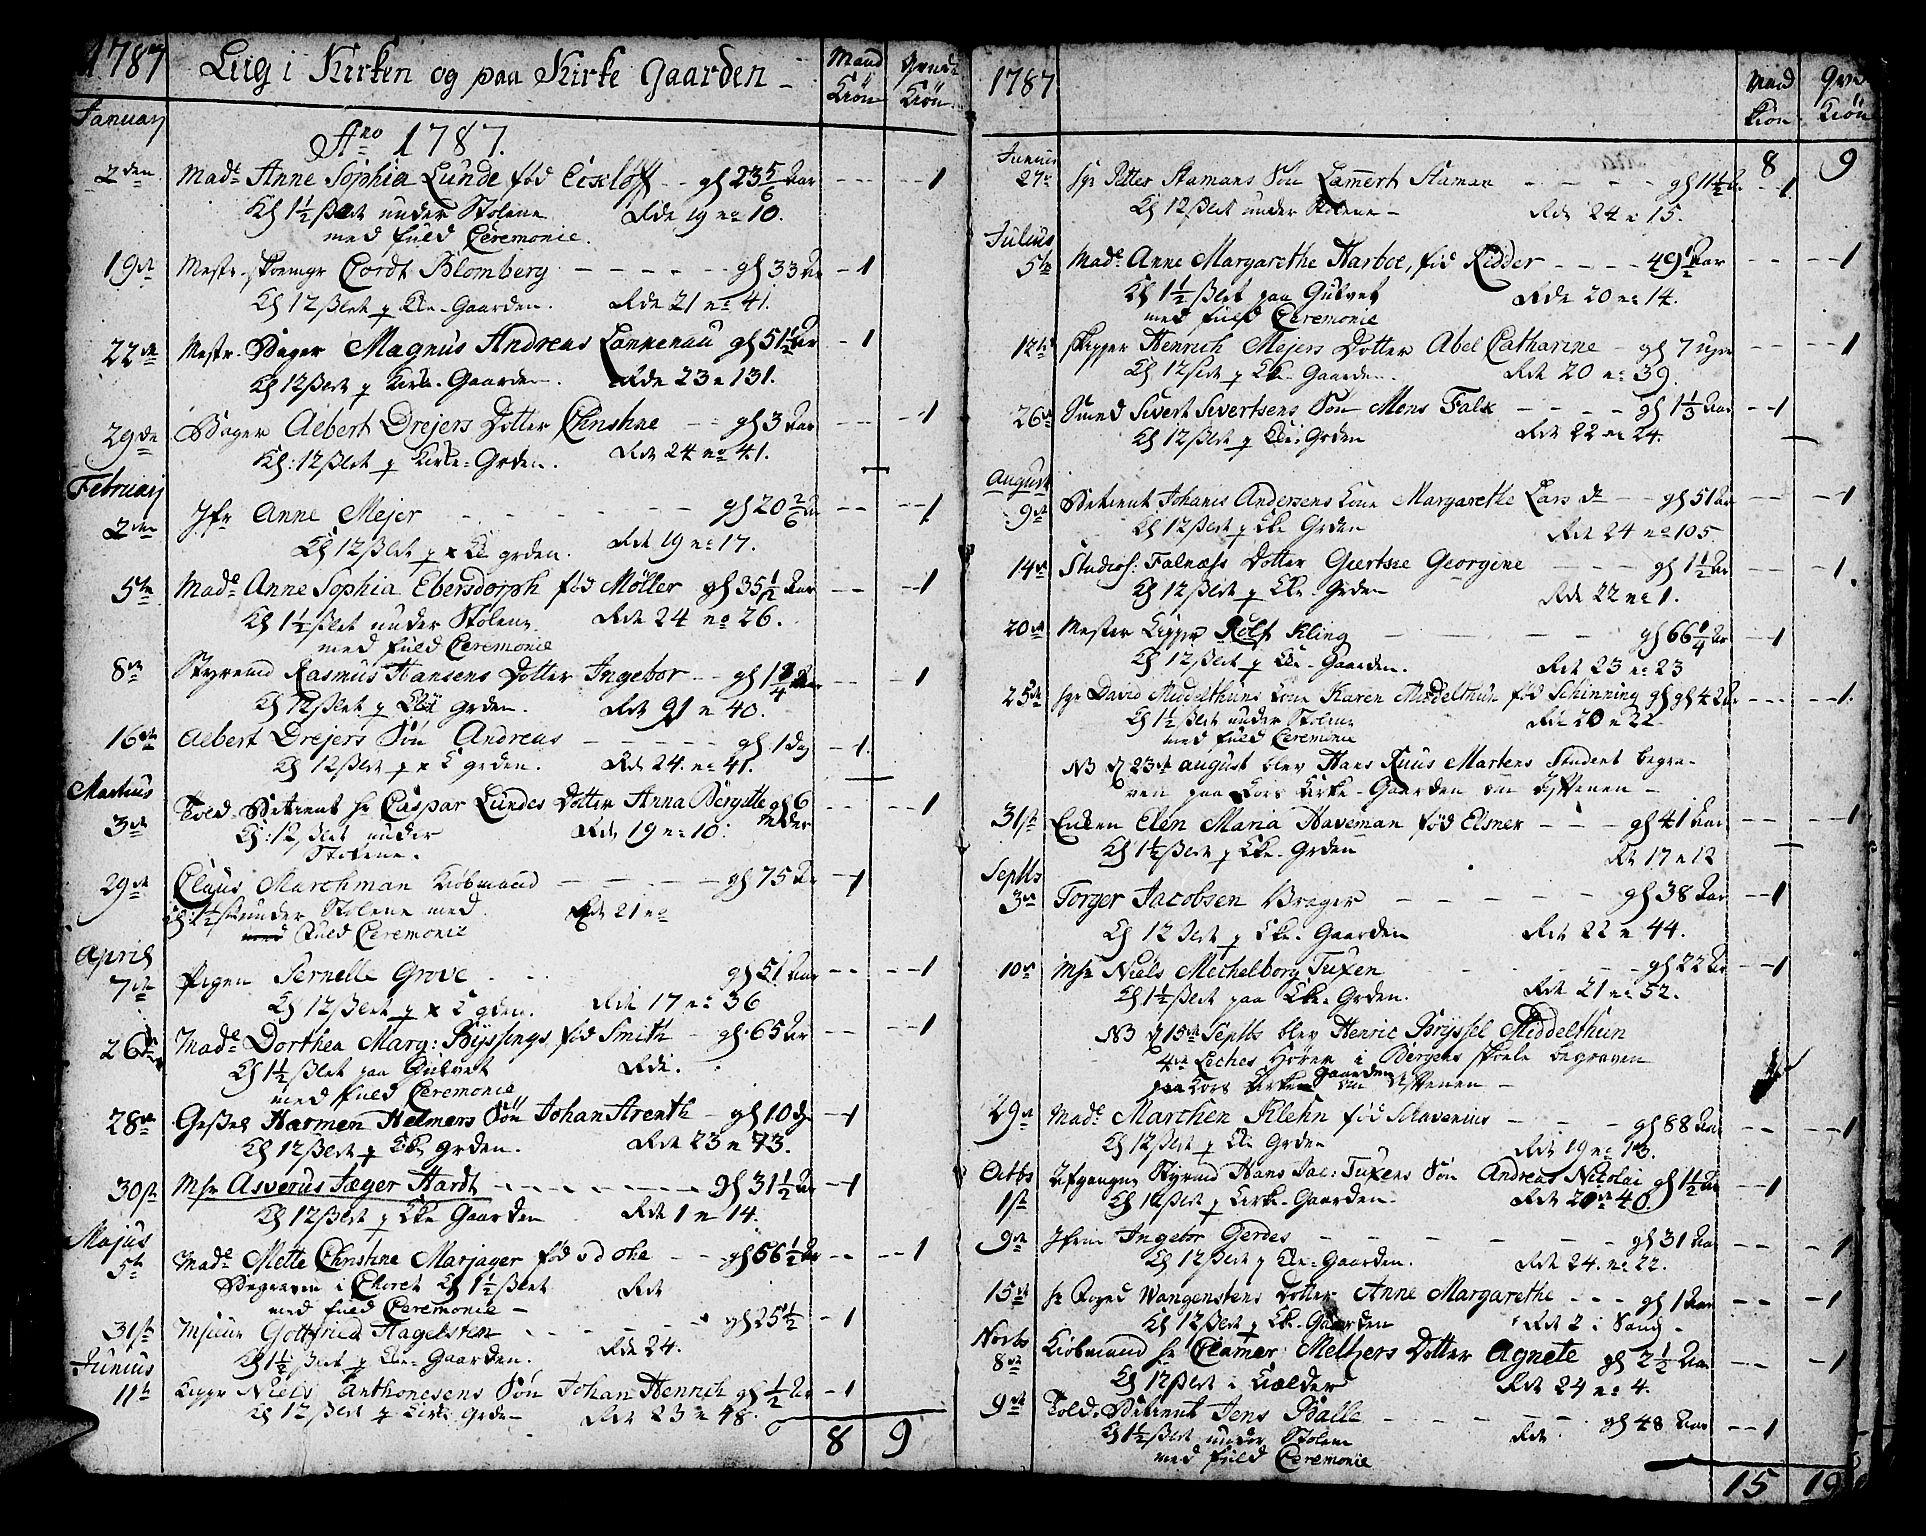 SAB, Korskirken Sokneprestembete, H/Haa/L0012: Ministerialbok nr. A 12, 1786-1832, s. 174